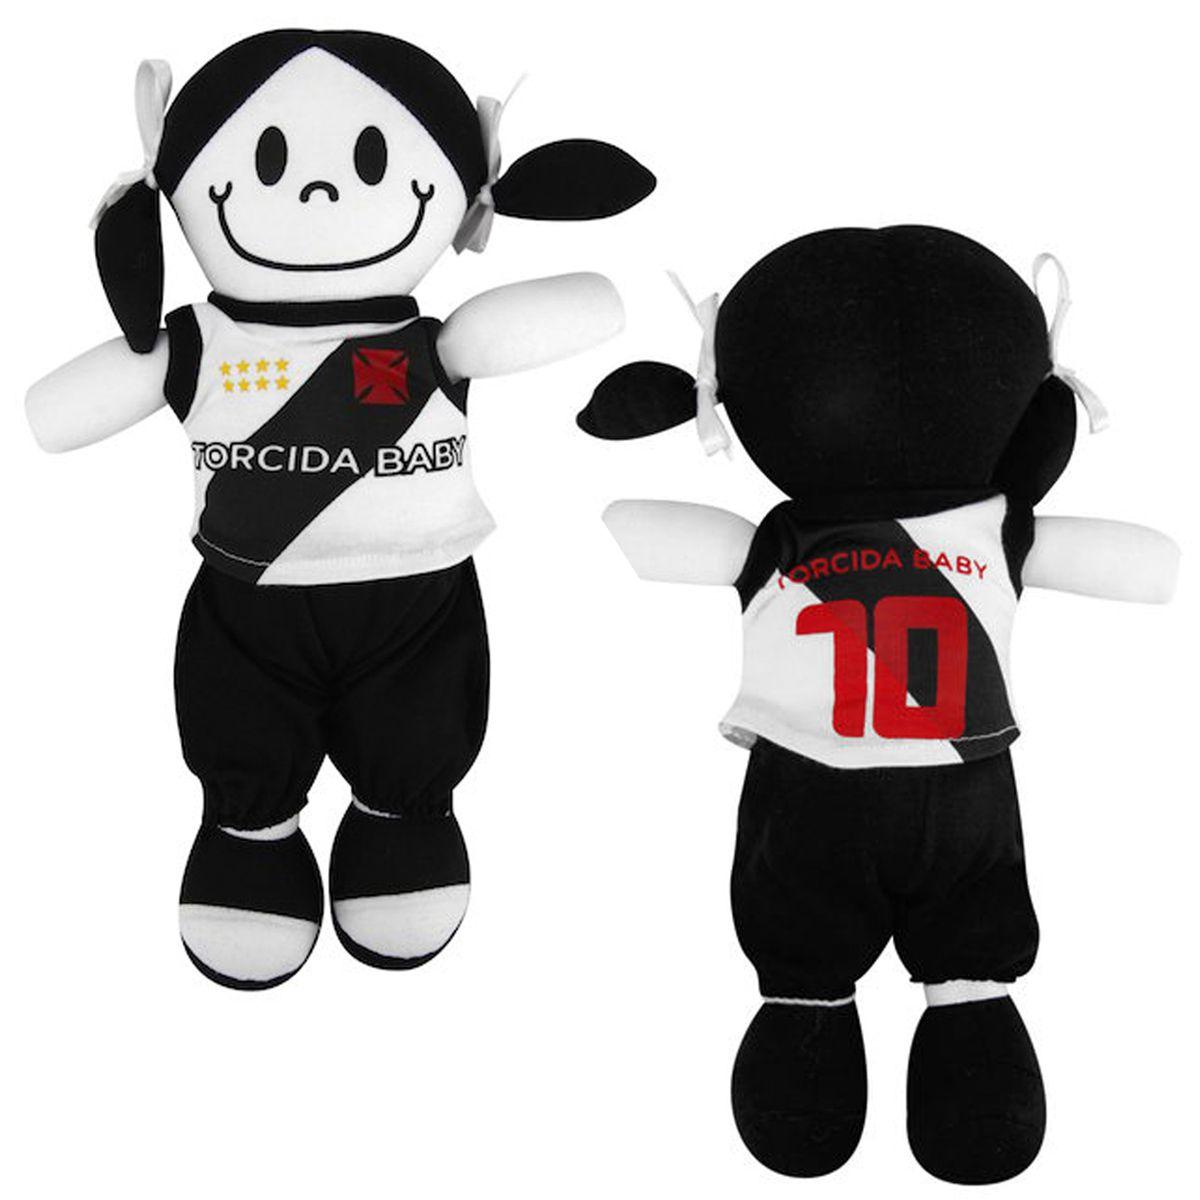 Boneca Mascote do Vasco da Gama - Torcida Baby 238B